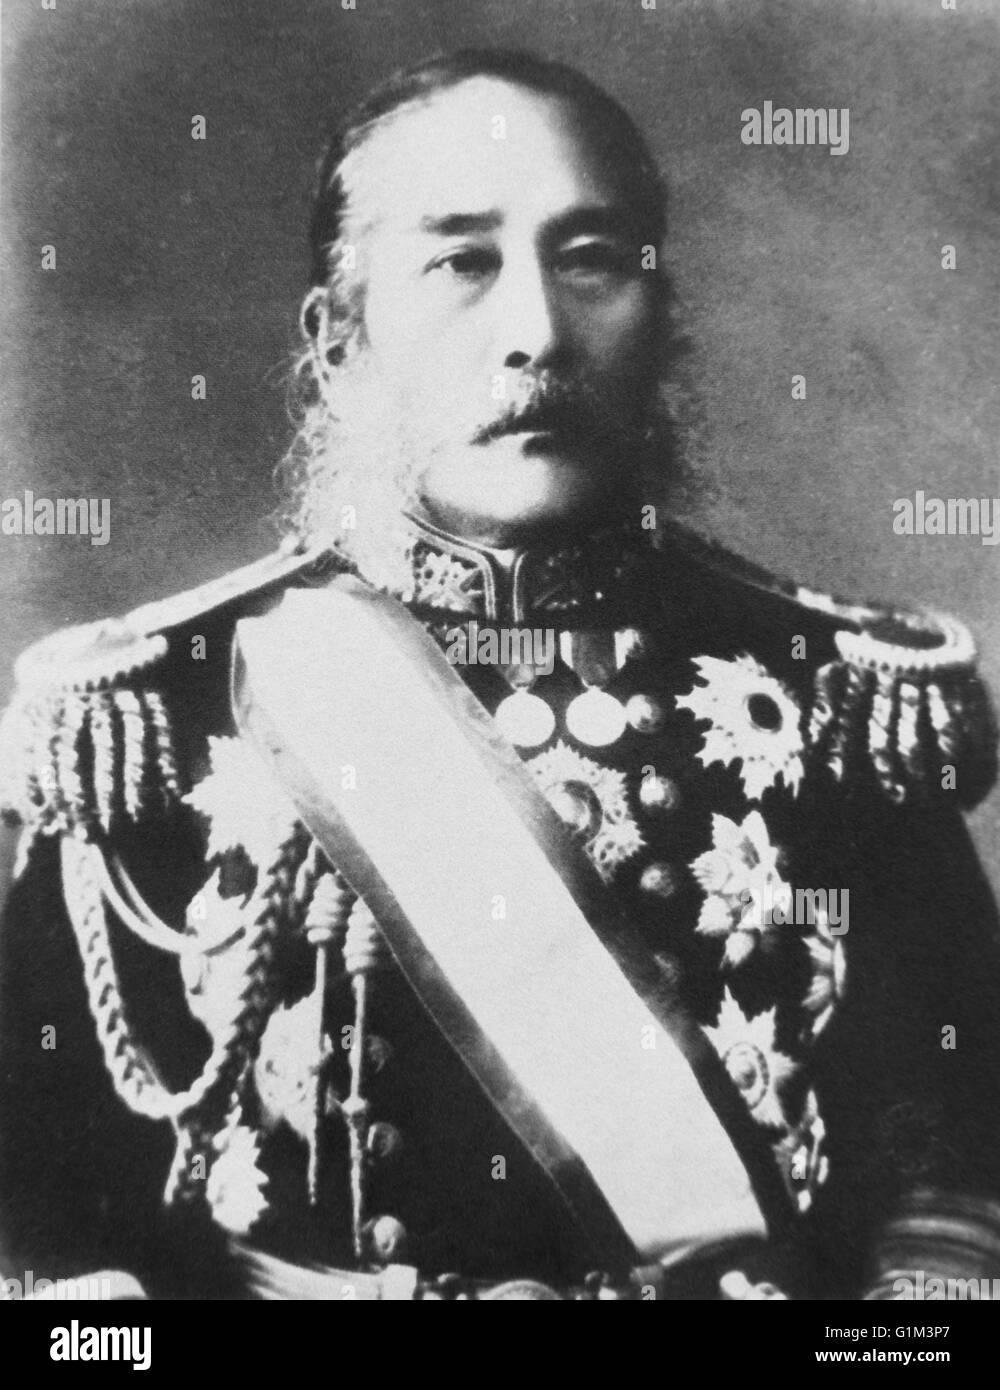 Portrait of Takeaki Enomoto (5 October 1836 – 26 October 1908) - Stock Image